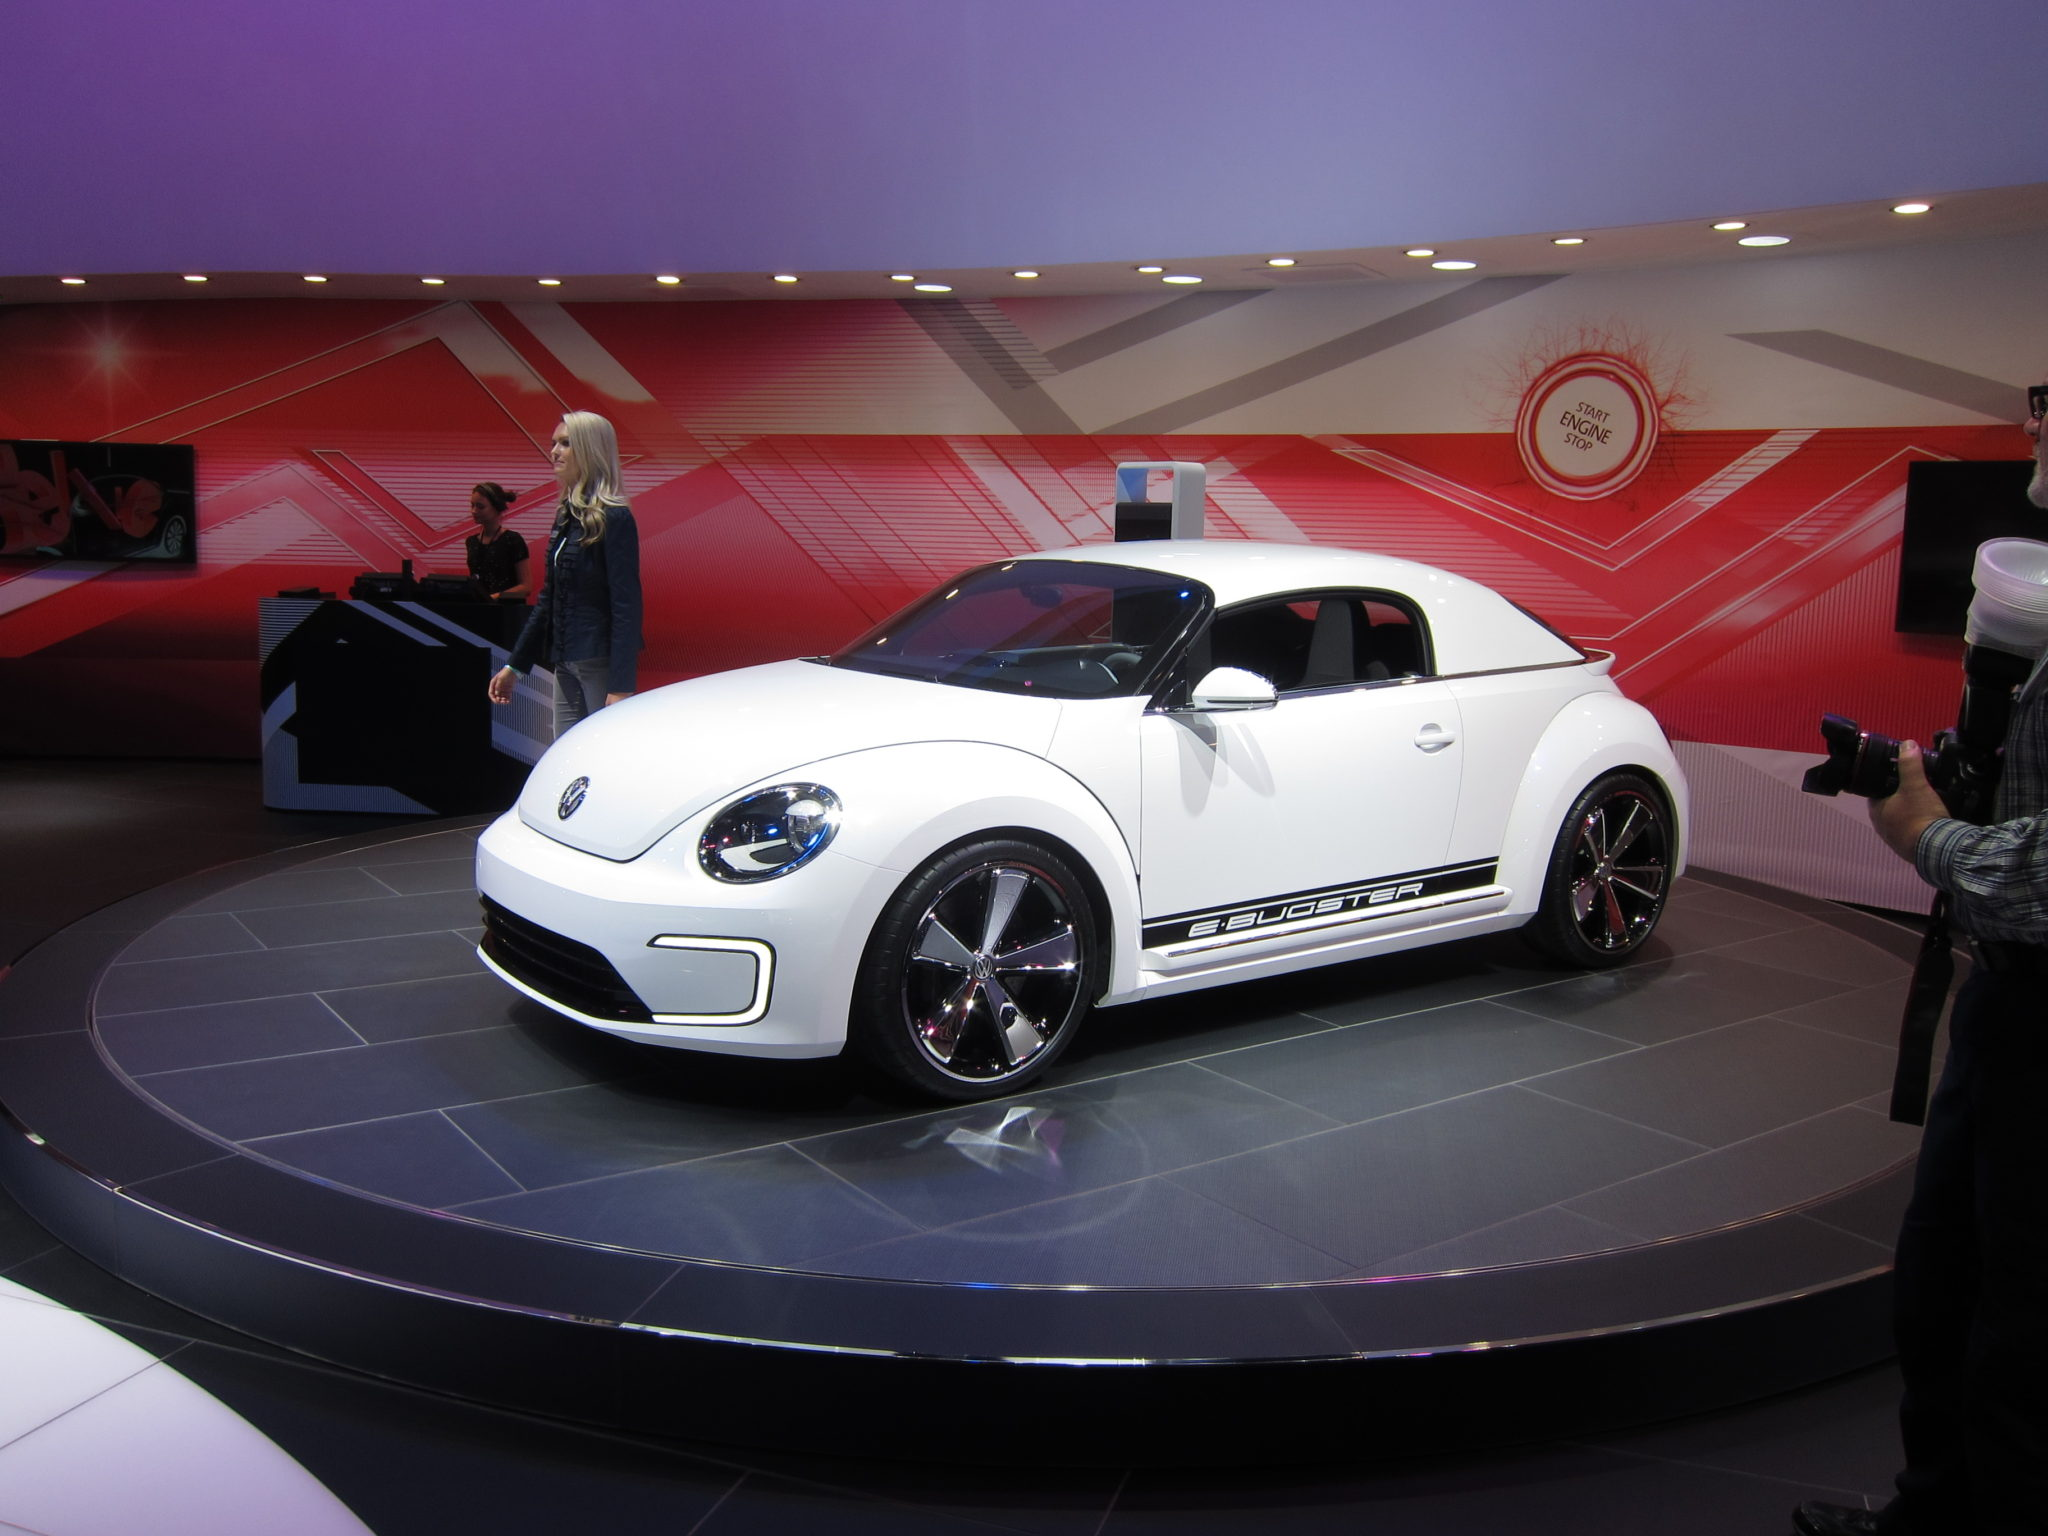 Volkswagen E-Bugster concept, 2012 Detroit Auto Show